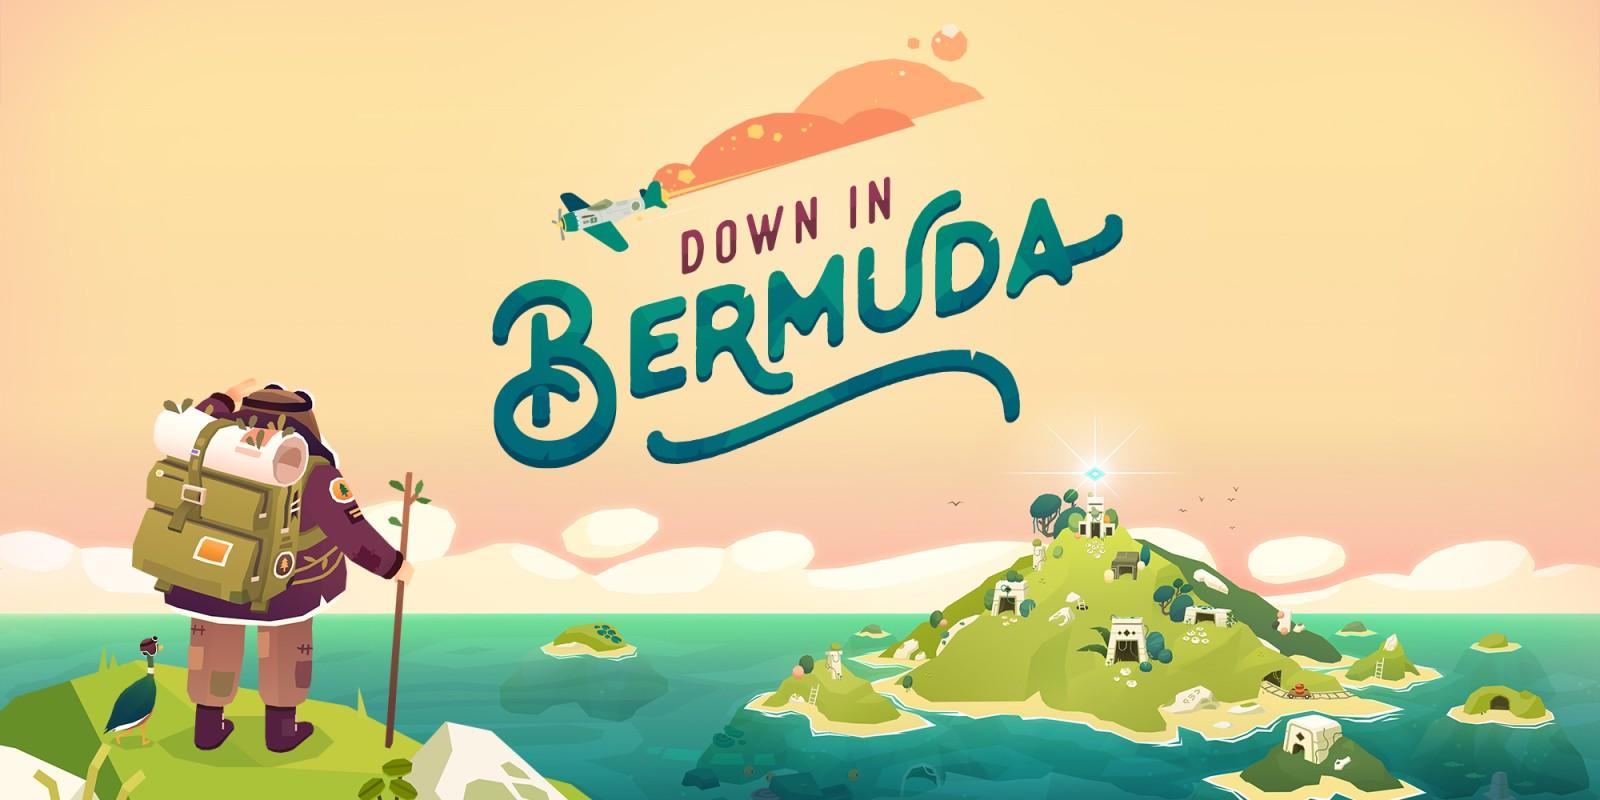 Down in Bermuda